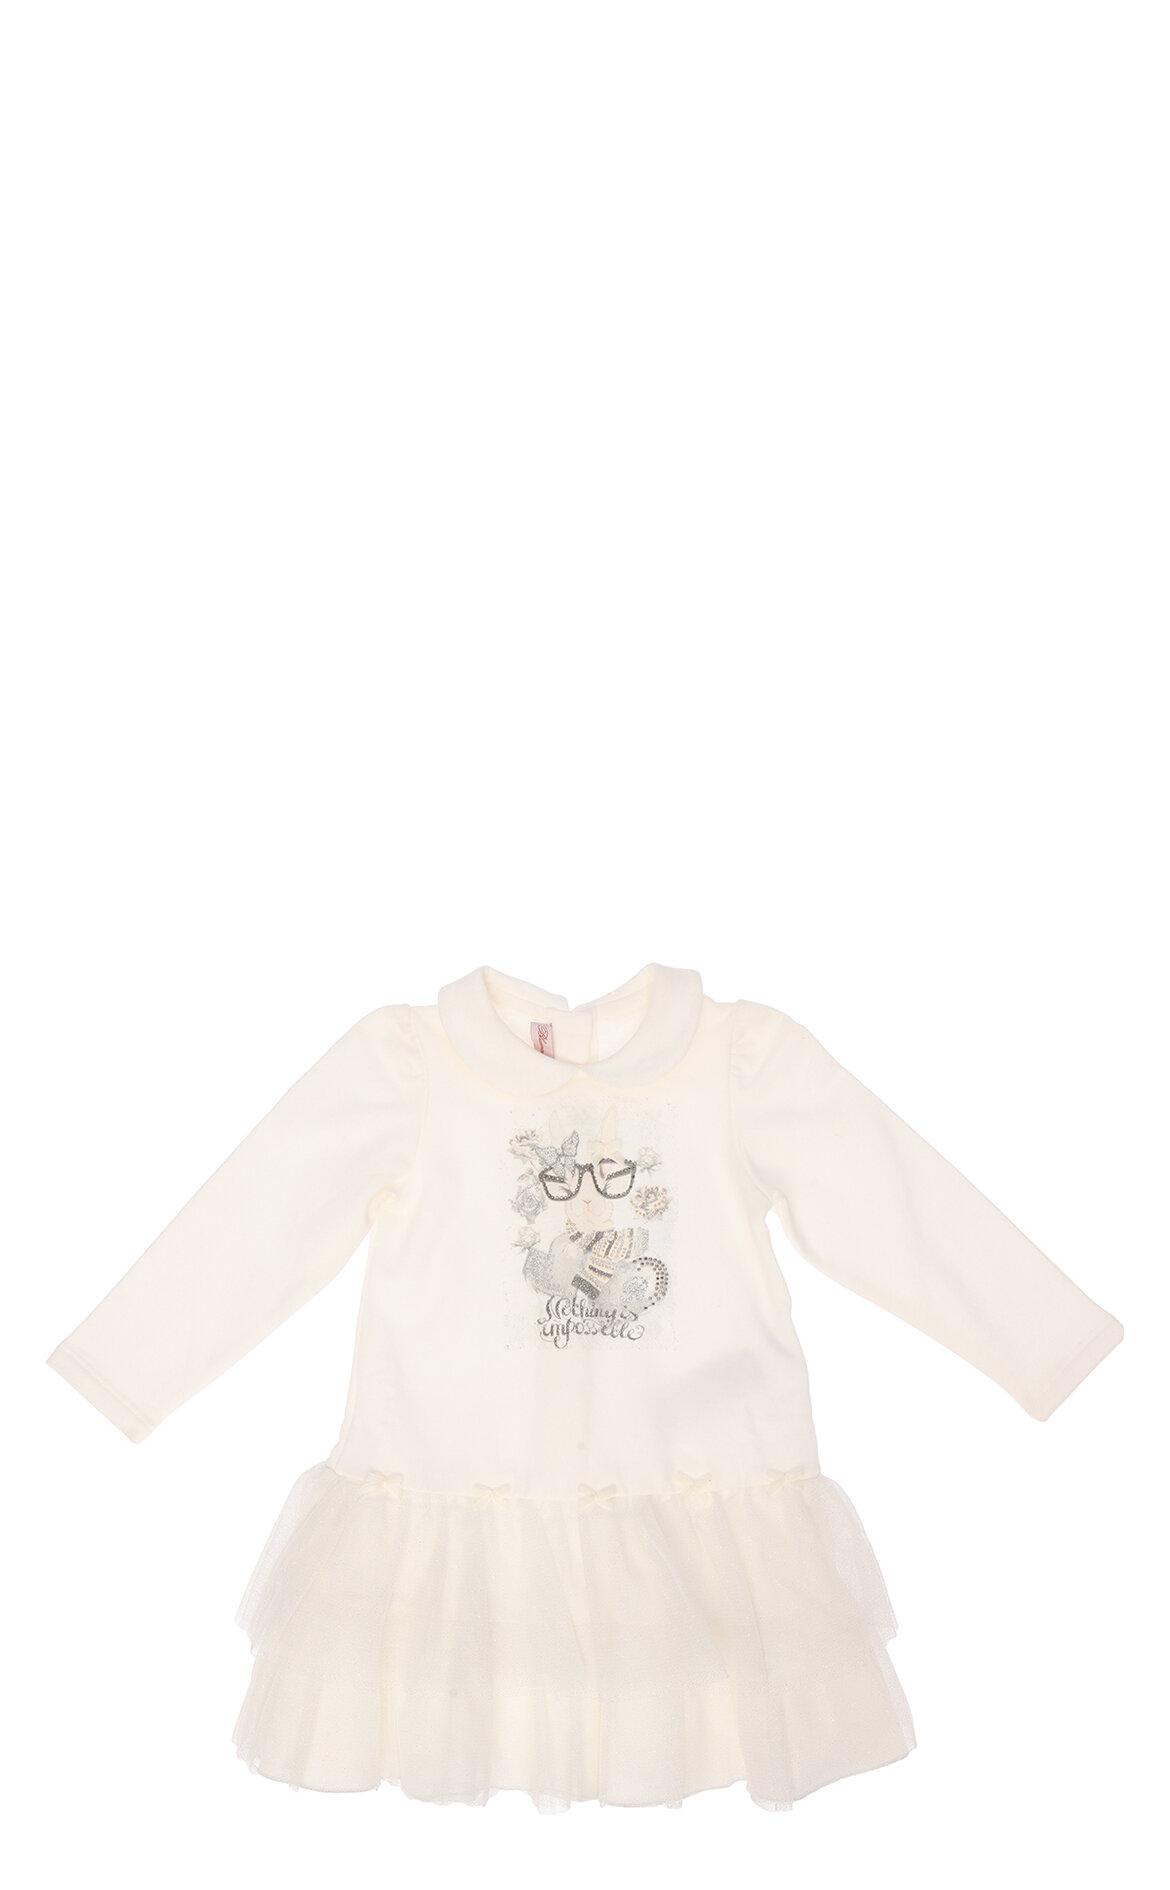 Miss Blumarine-Miss Blumarine Tül Detaylı Beyaz Elbise